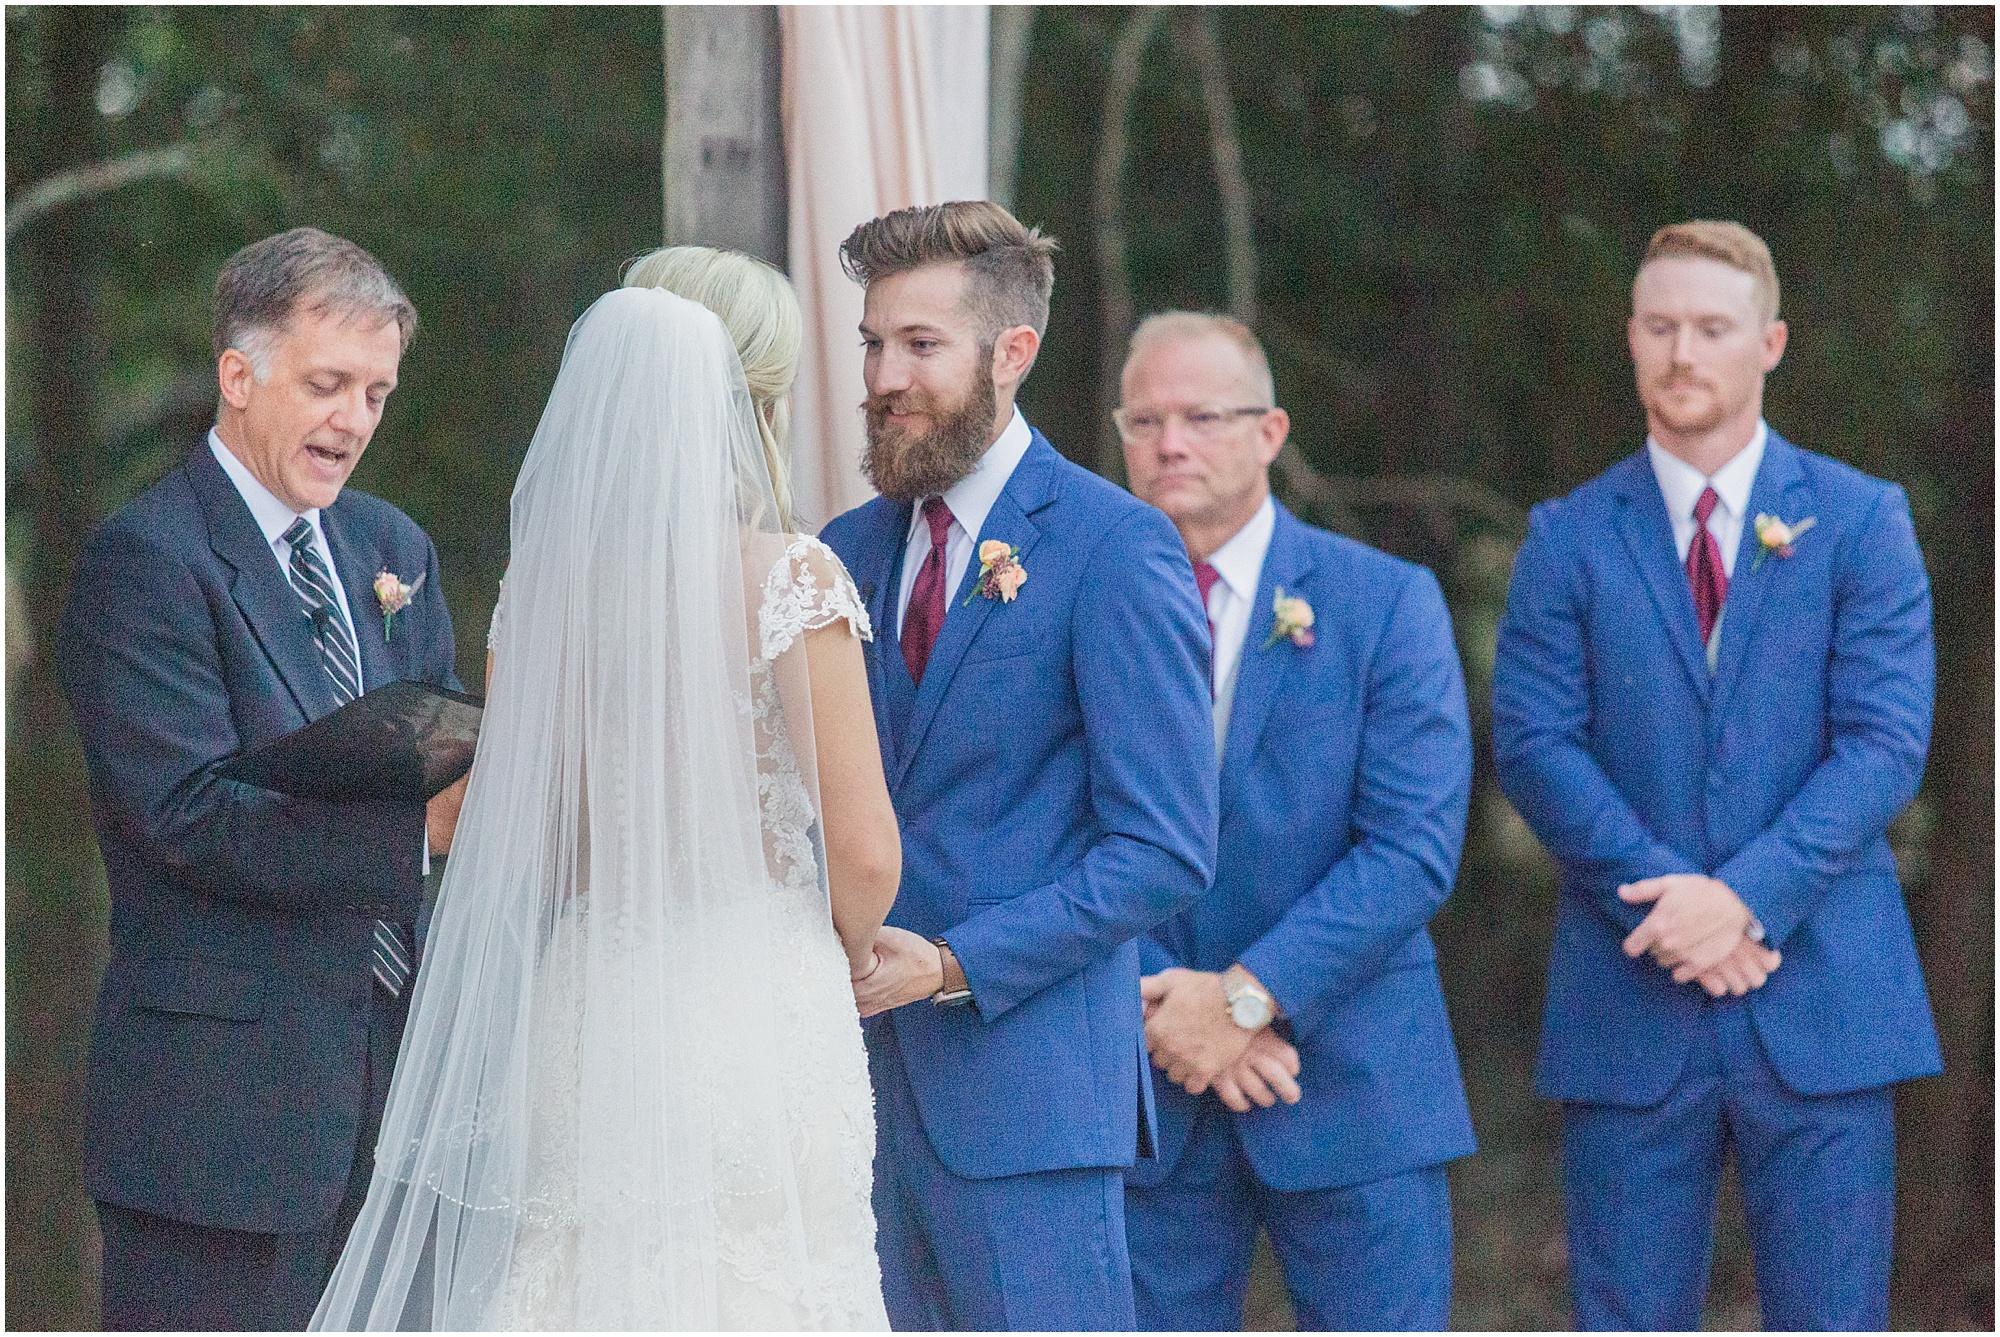 fall-wedding-bridlewood-of-madison-mississippi_0055.jpg